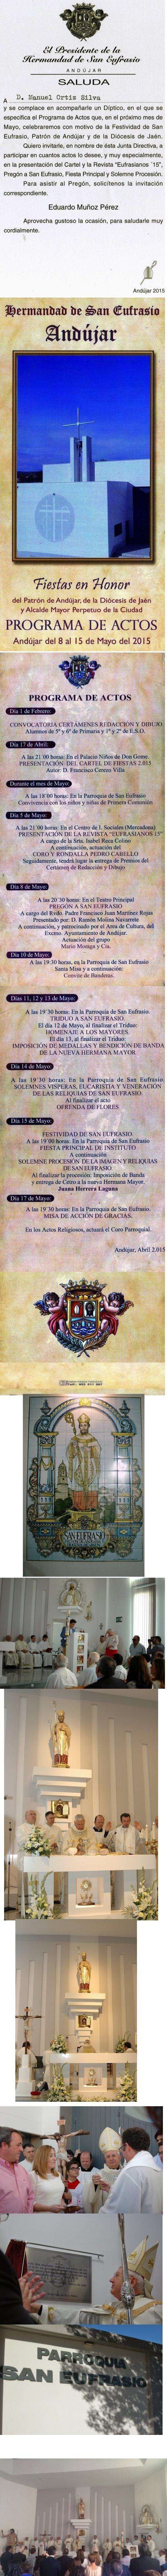 20150526103341-templo-parroquial-nuevo-andujar-2015-.jpg